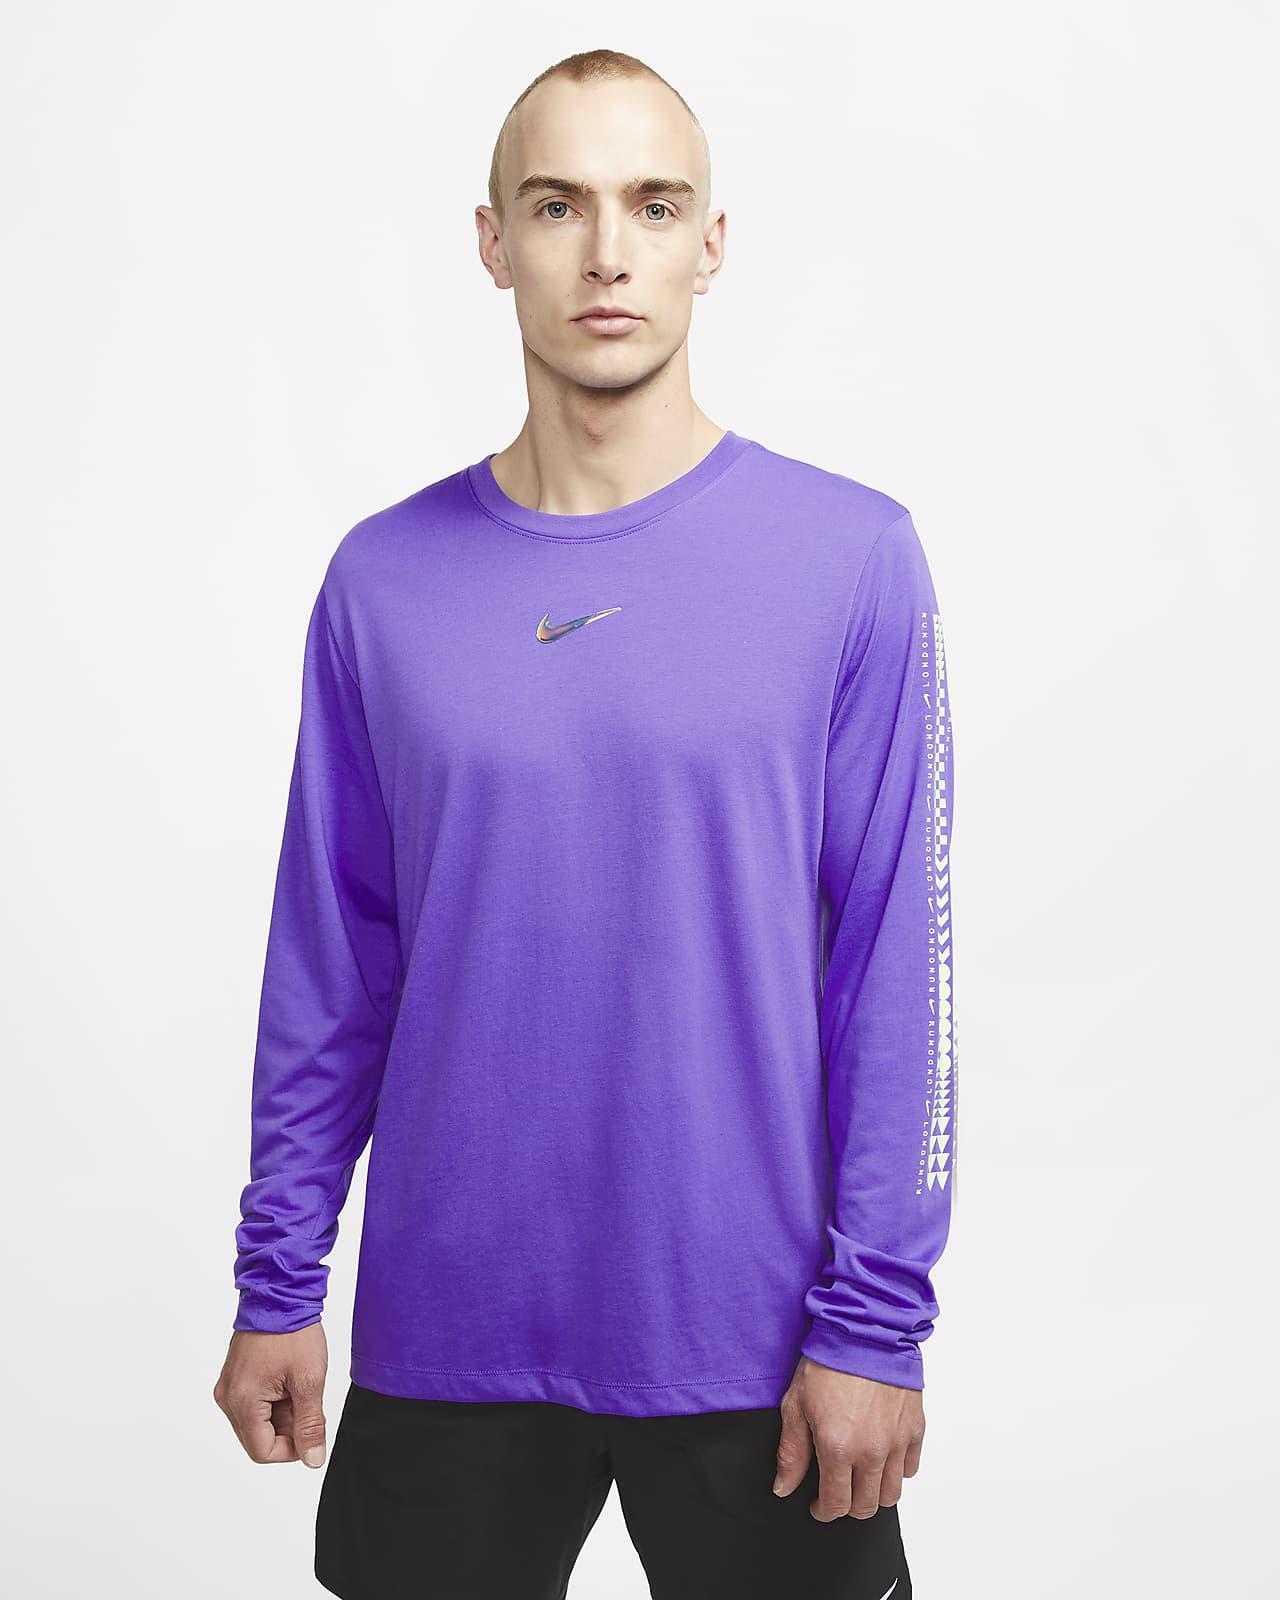 Nike Dri-FIT London løpe-T-skjorte